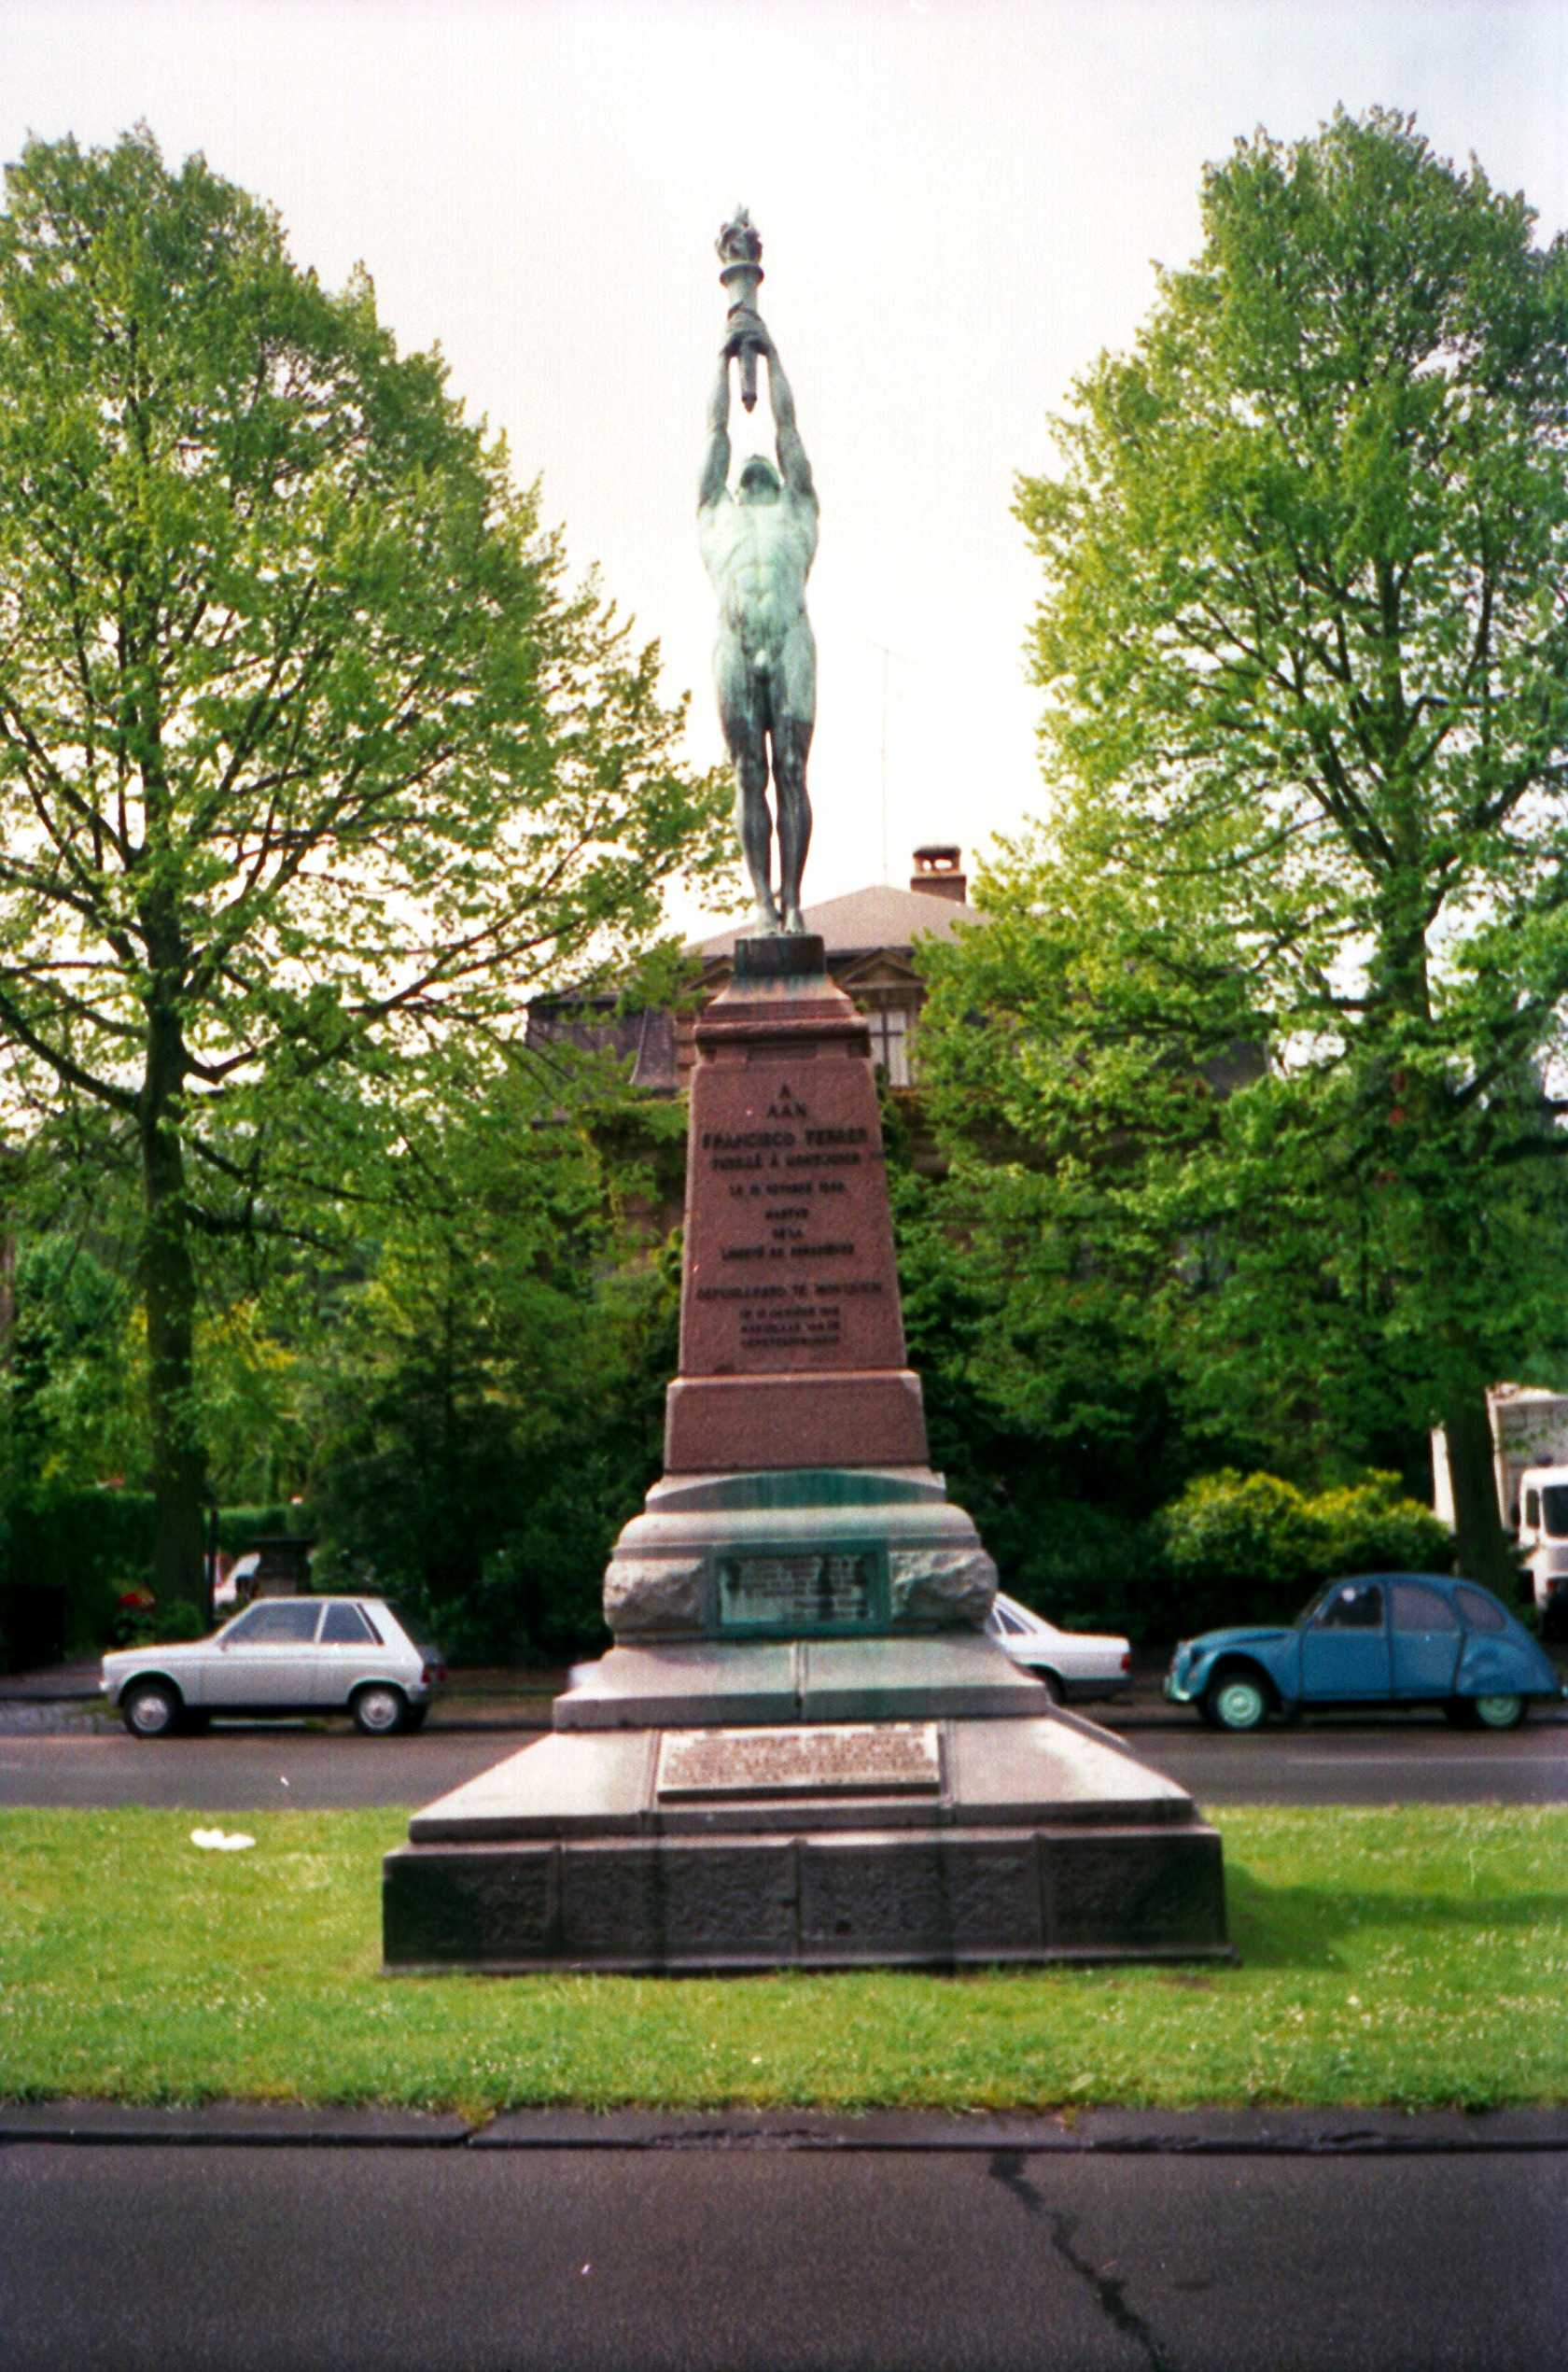 Monument a Ferrer a Brussel·les